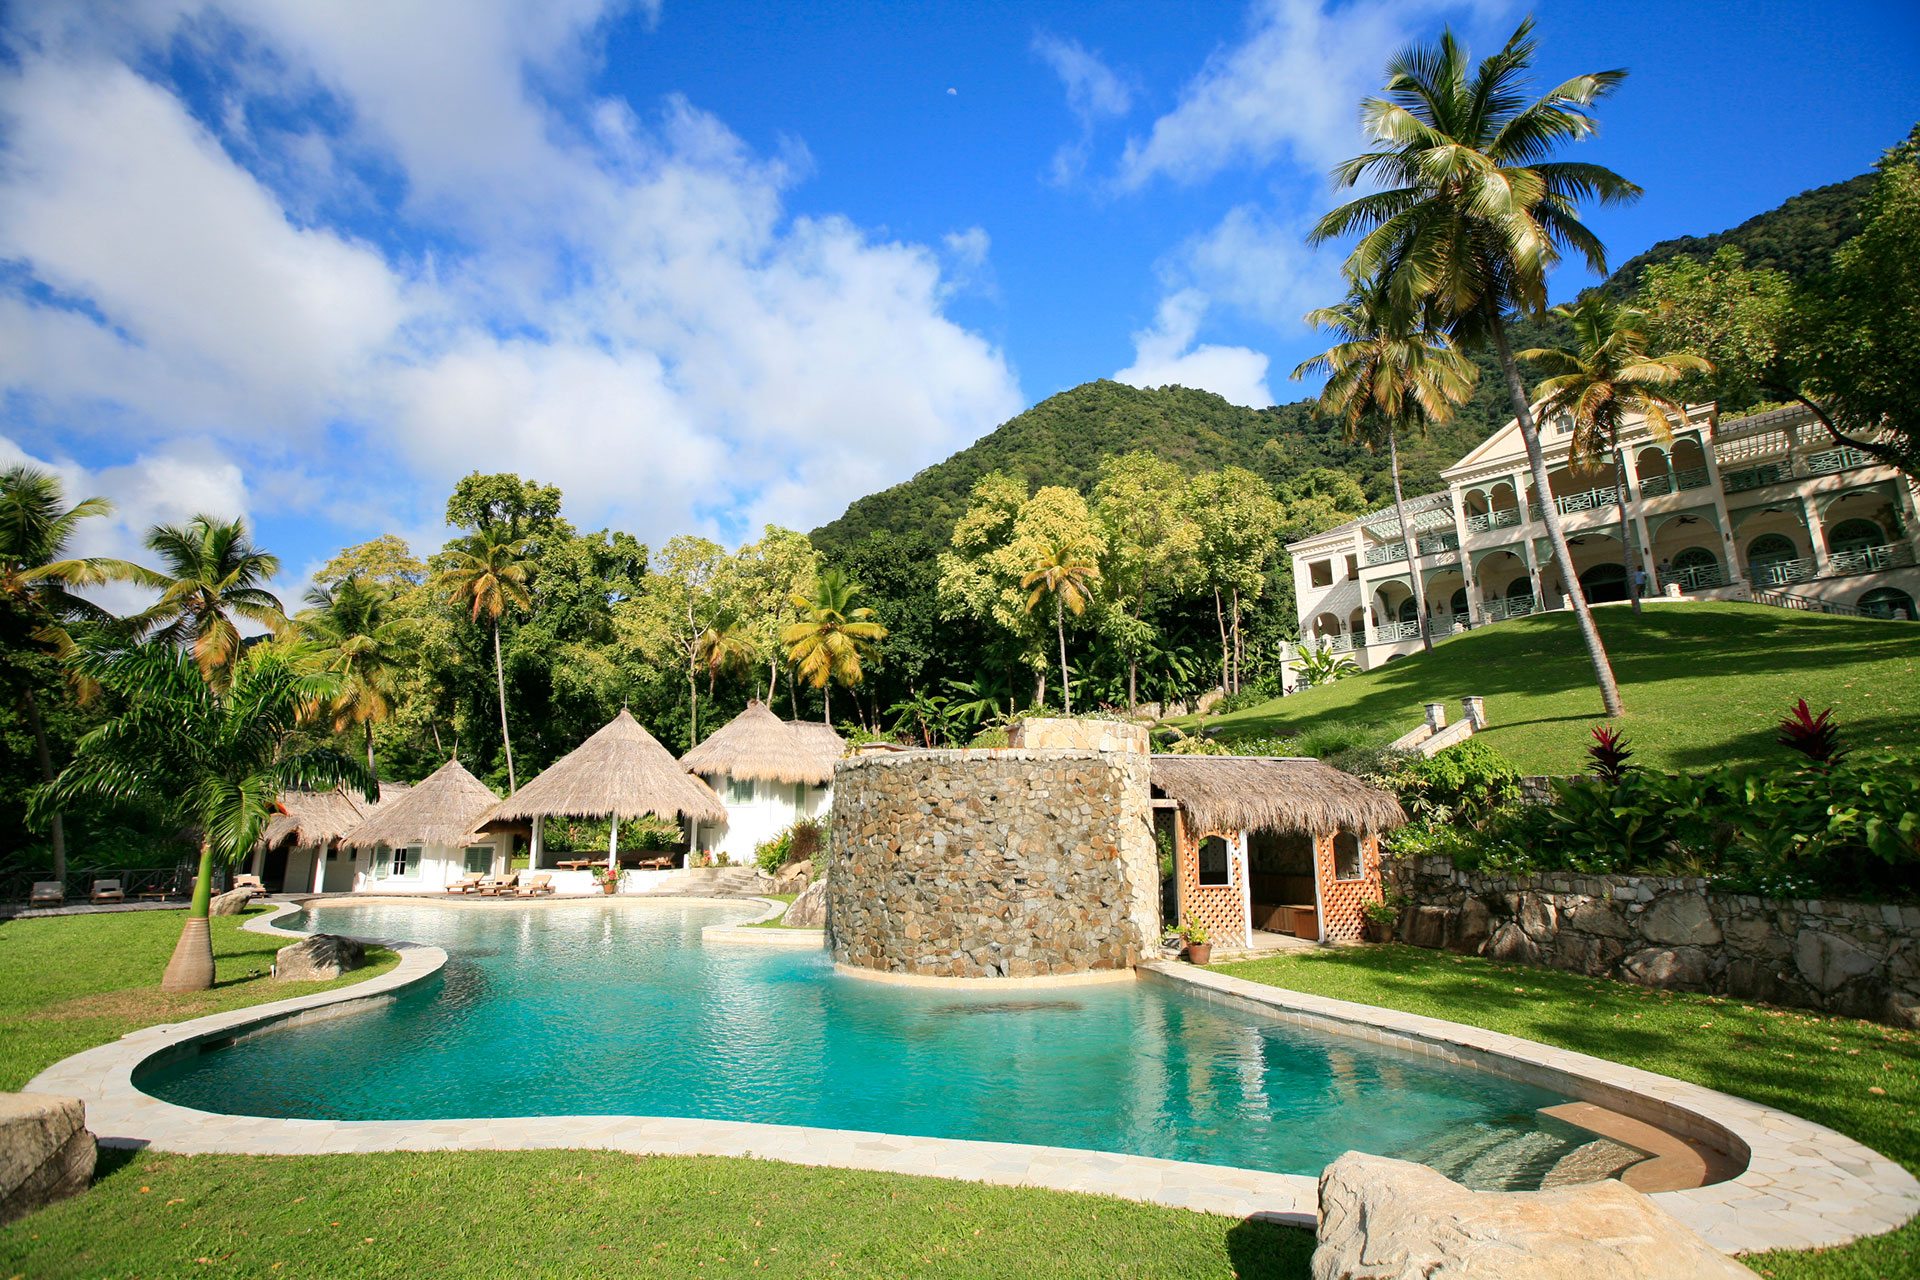 Caribbean home exterior